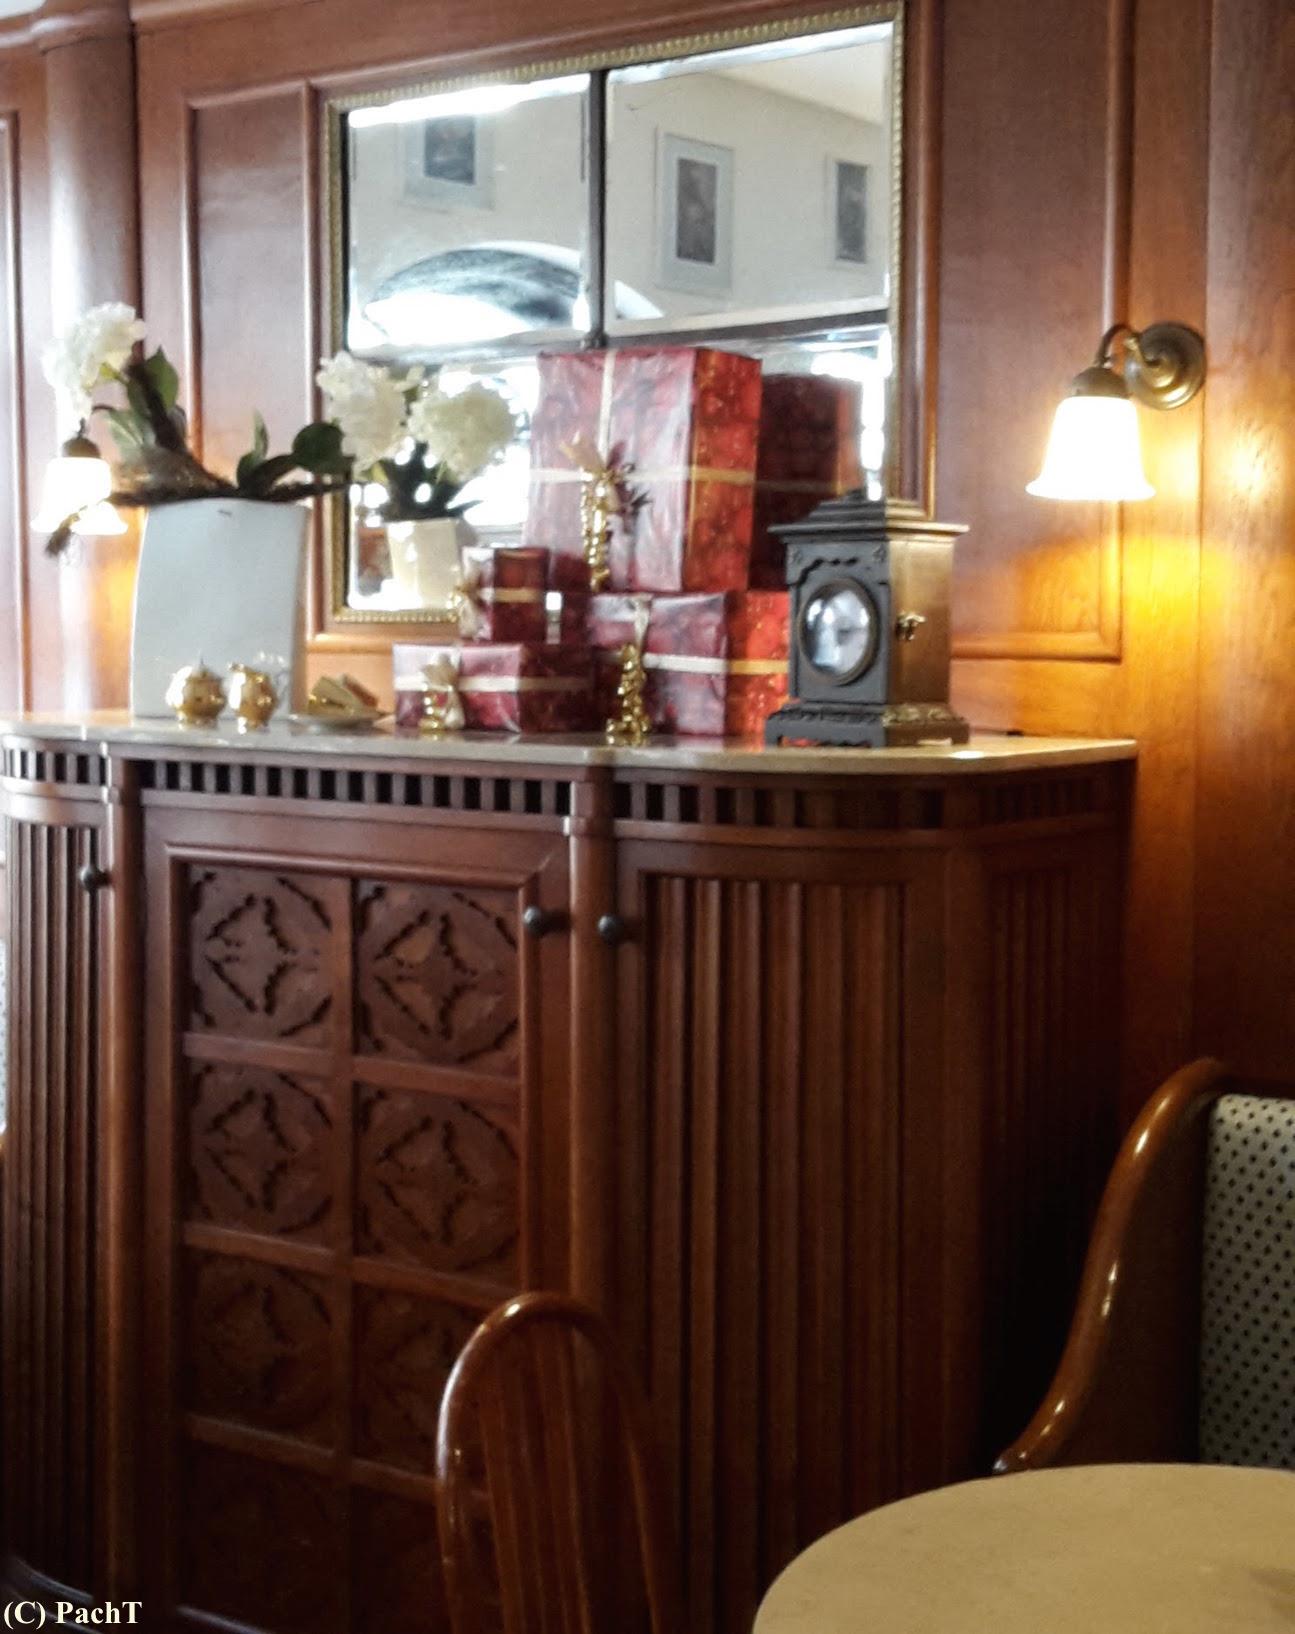 2017.12.22 Cafe Rommel EF 2